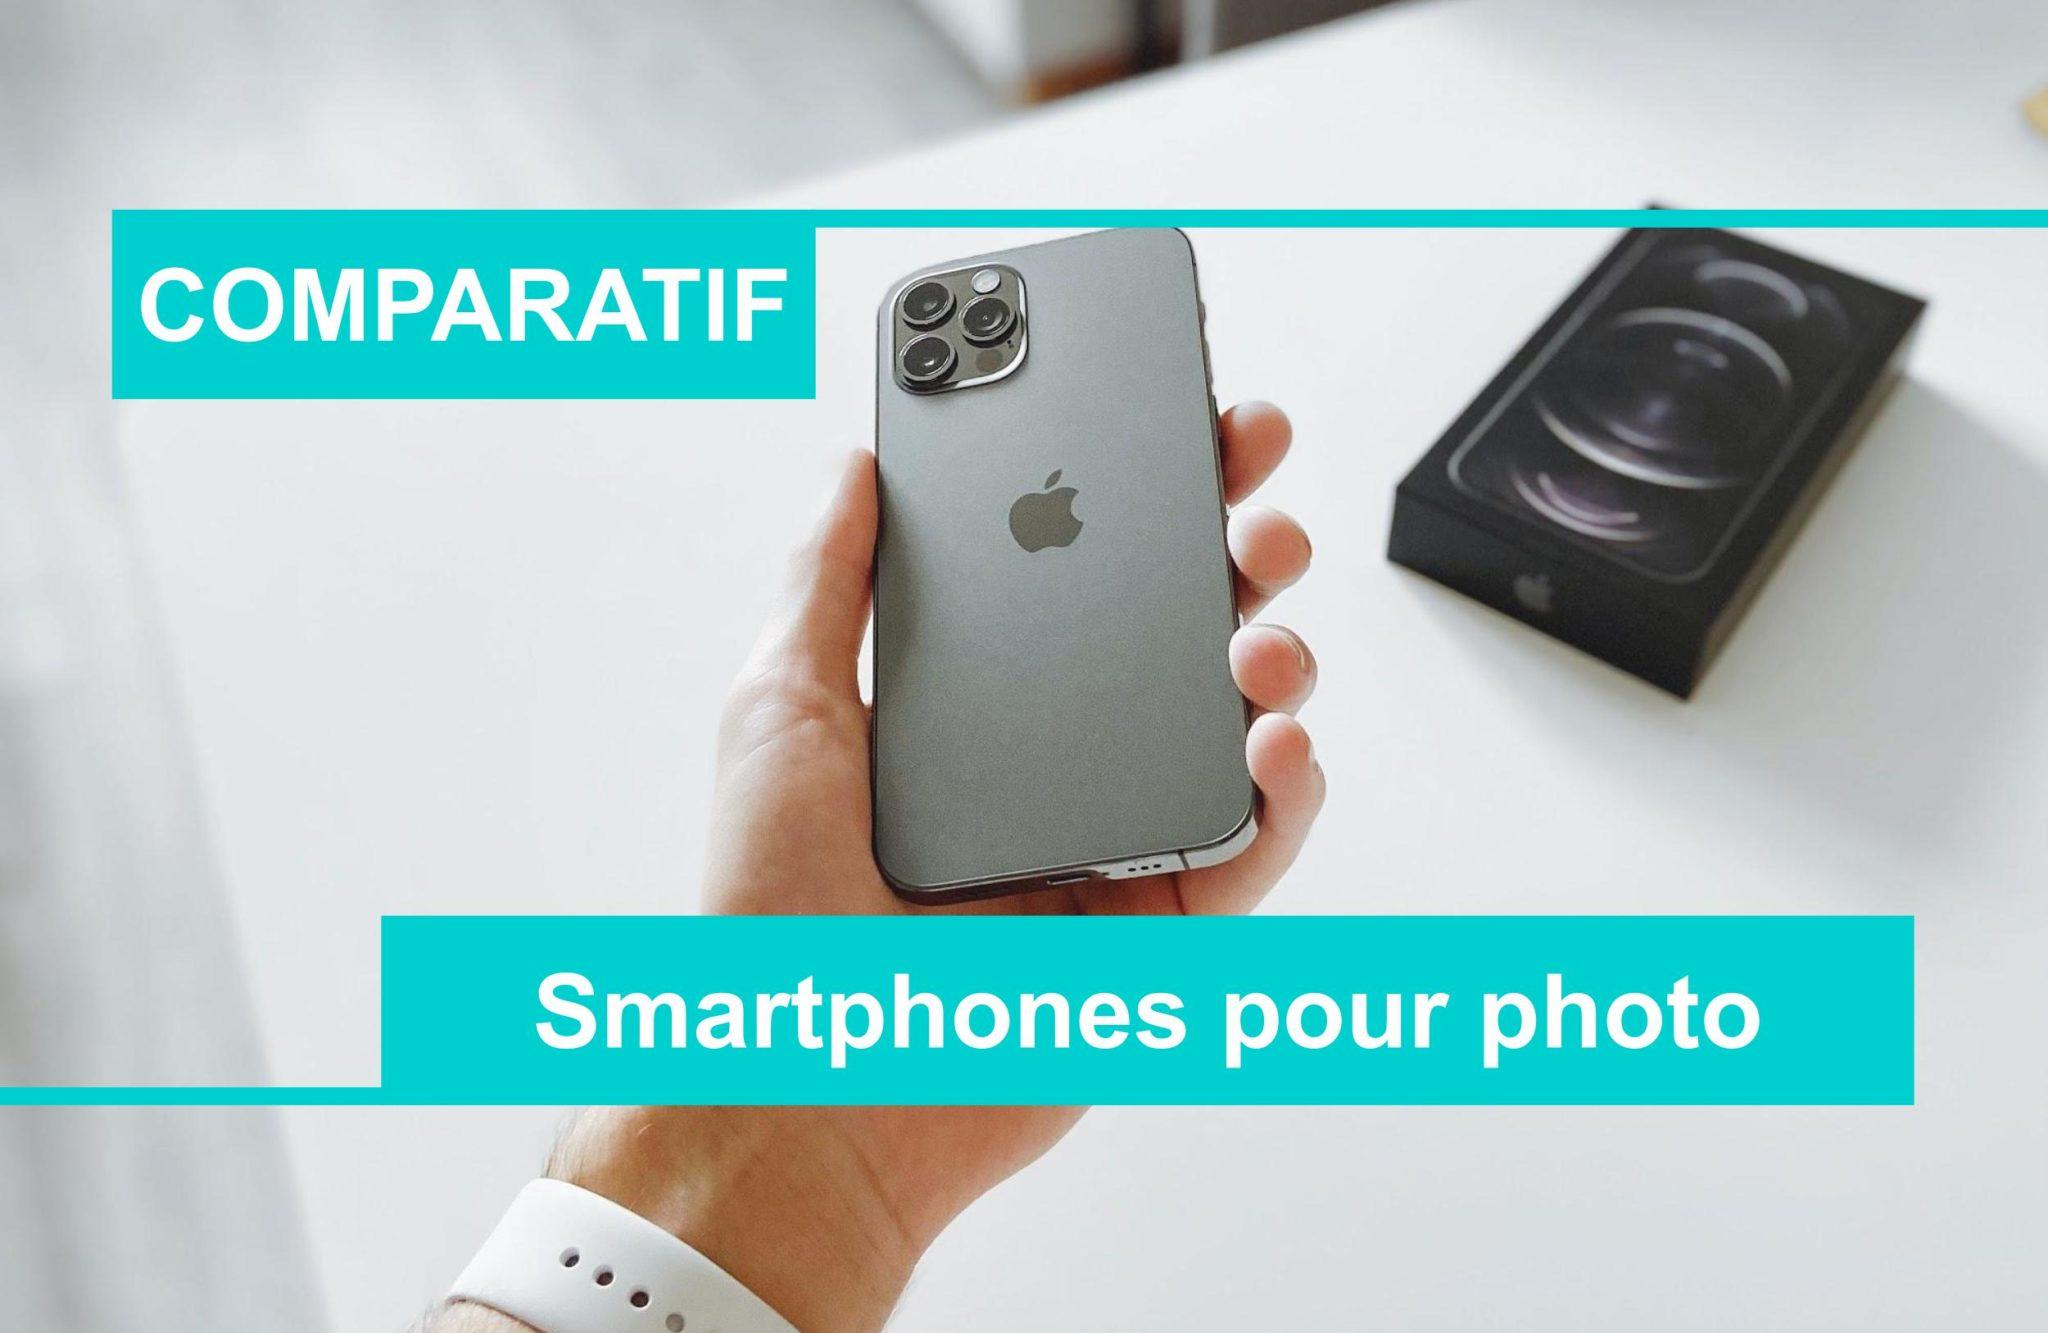 COMPARATIF meilleur smartphone photo